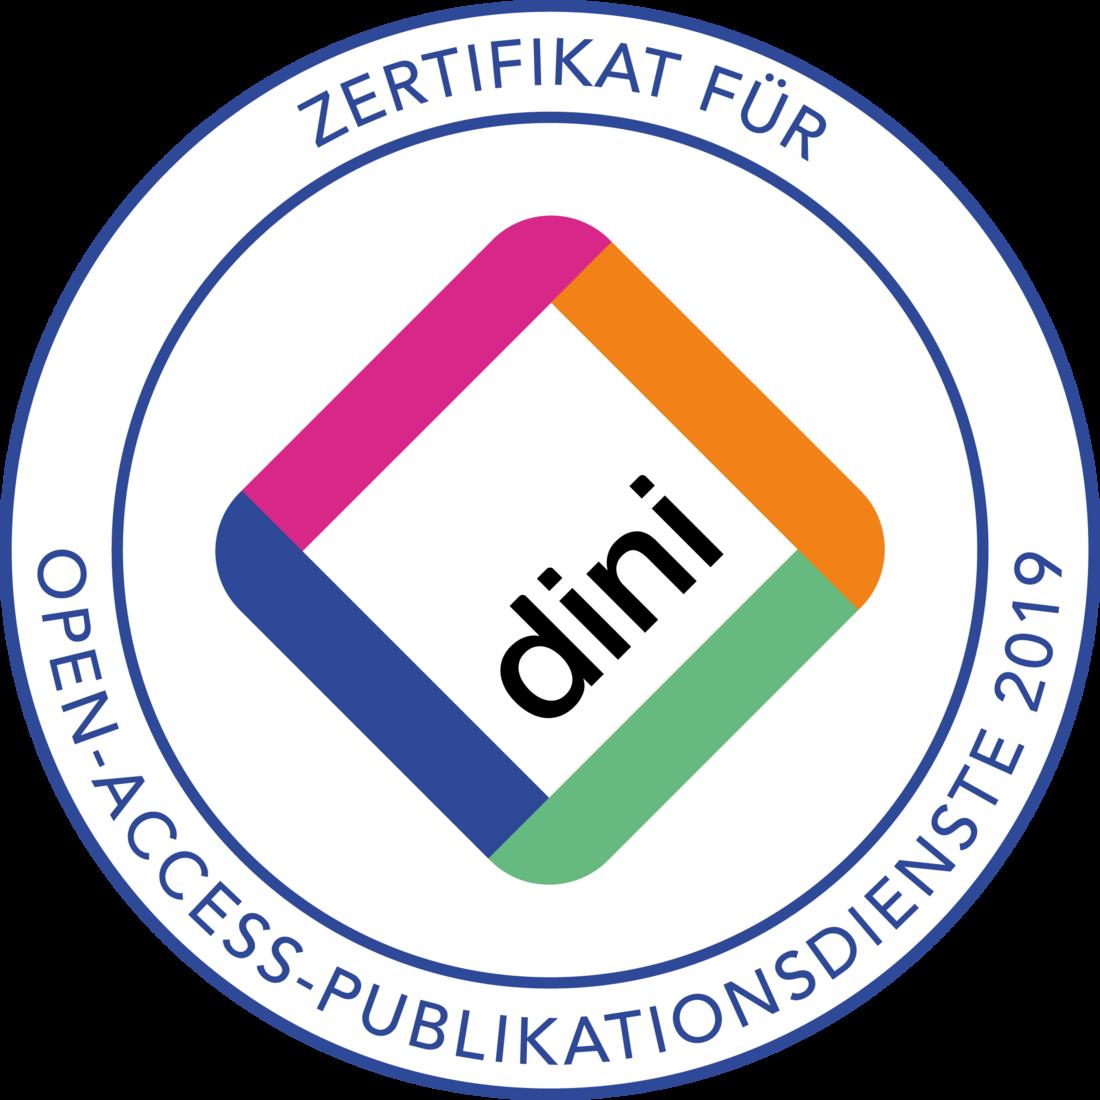 DINI - Zertifikat für Open-Access-Publikationsdienste 2019